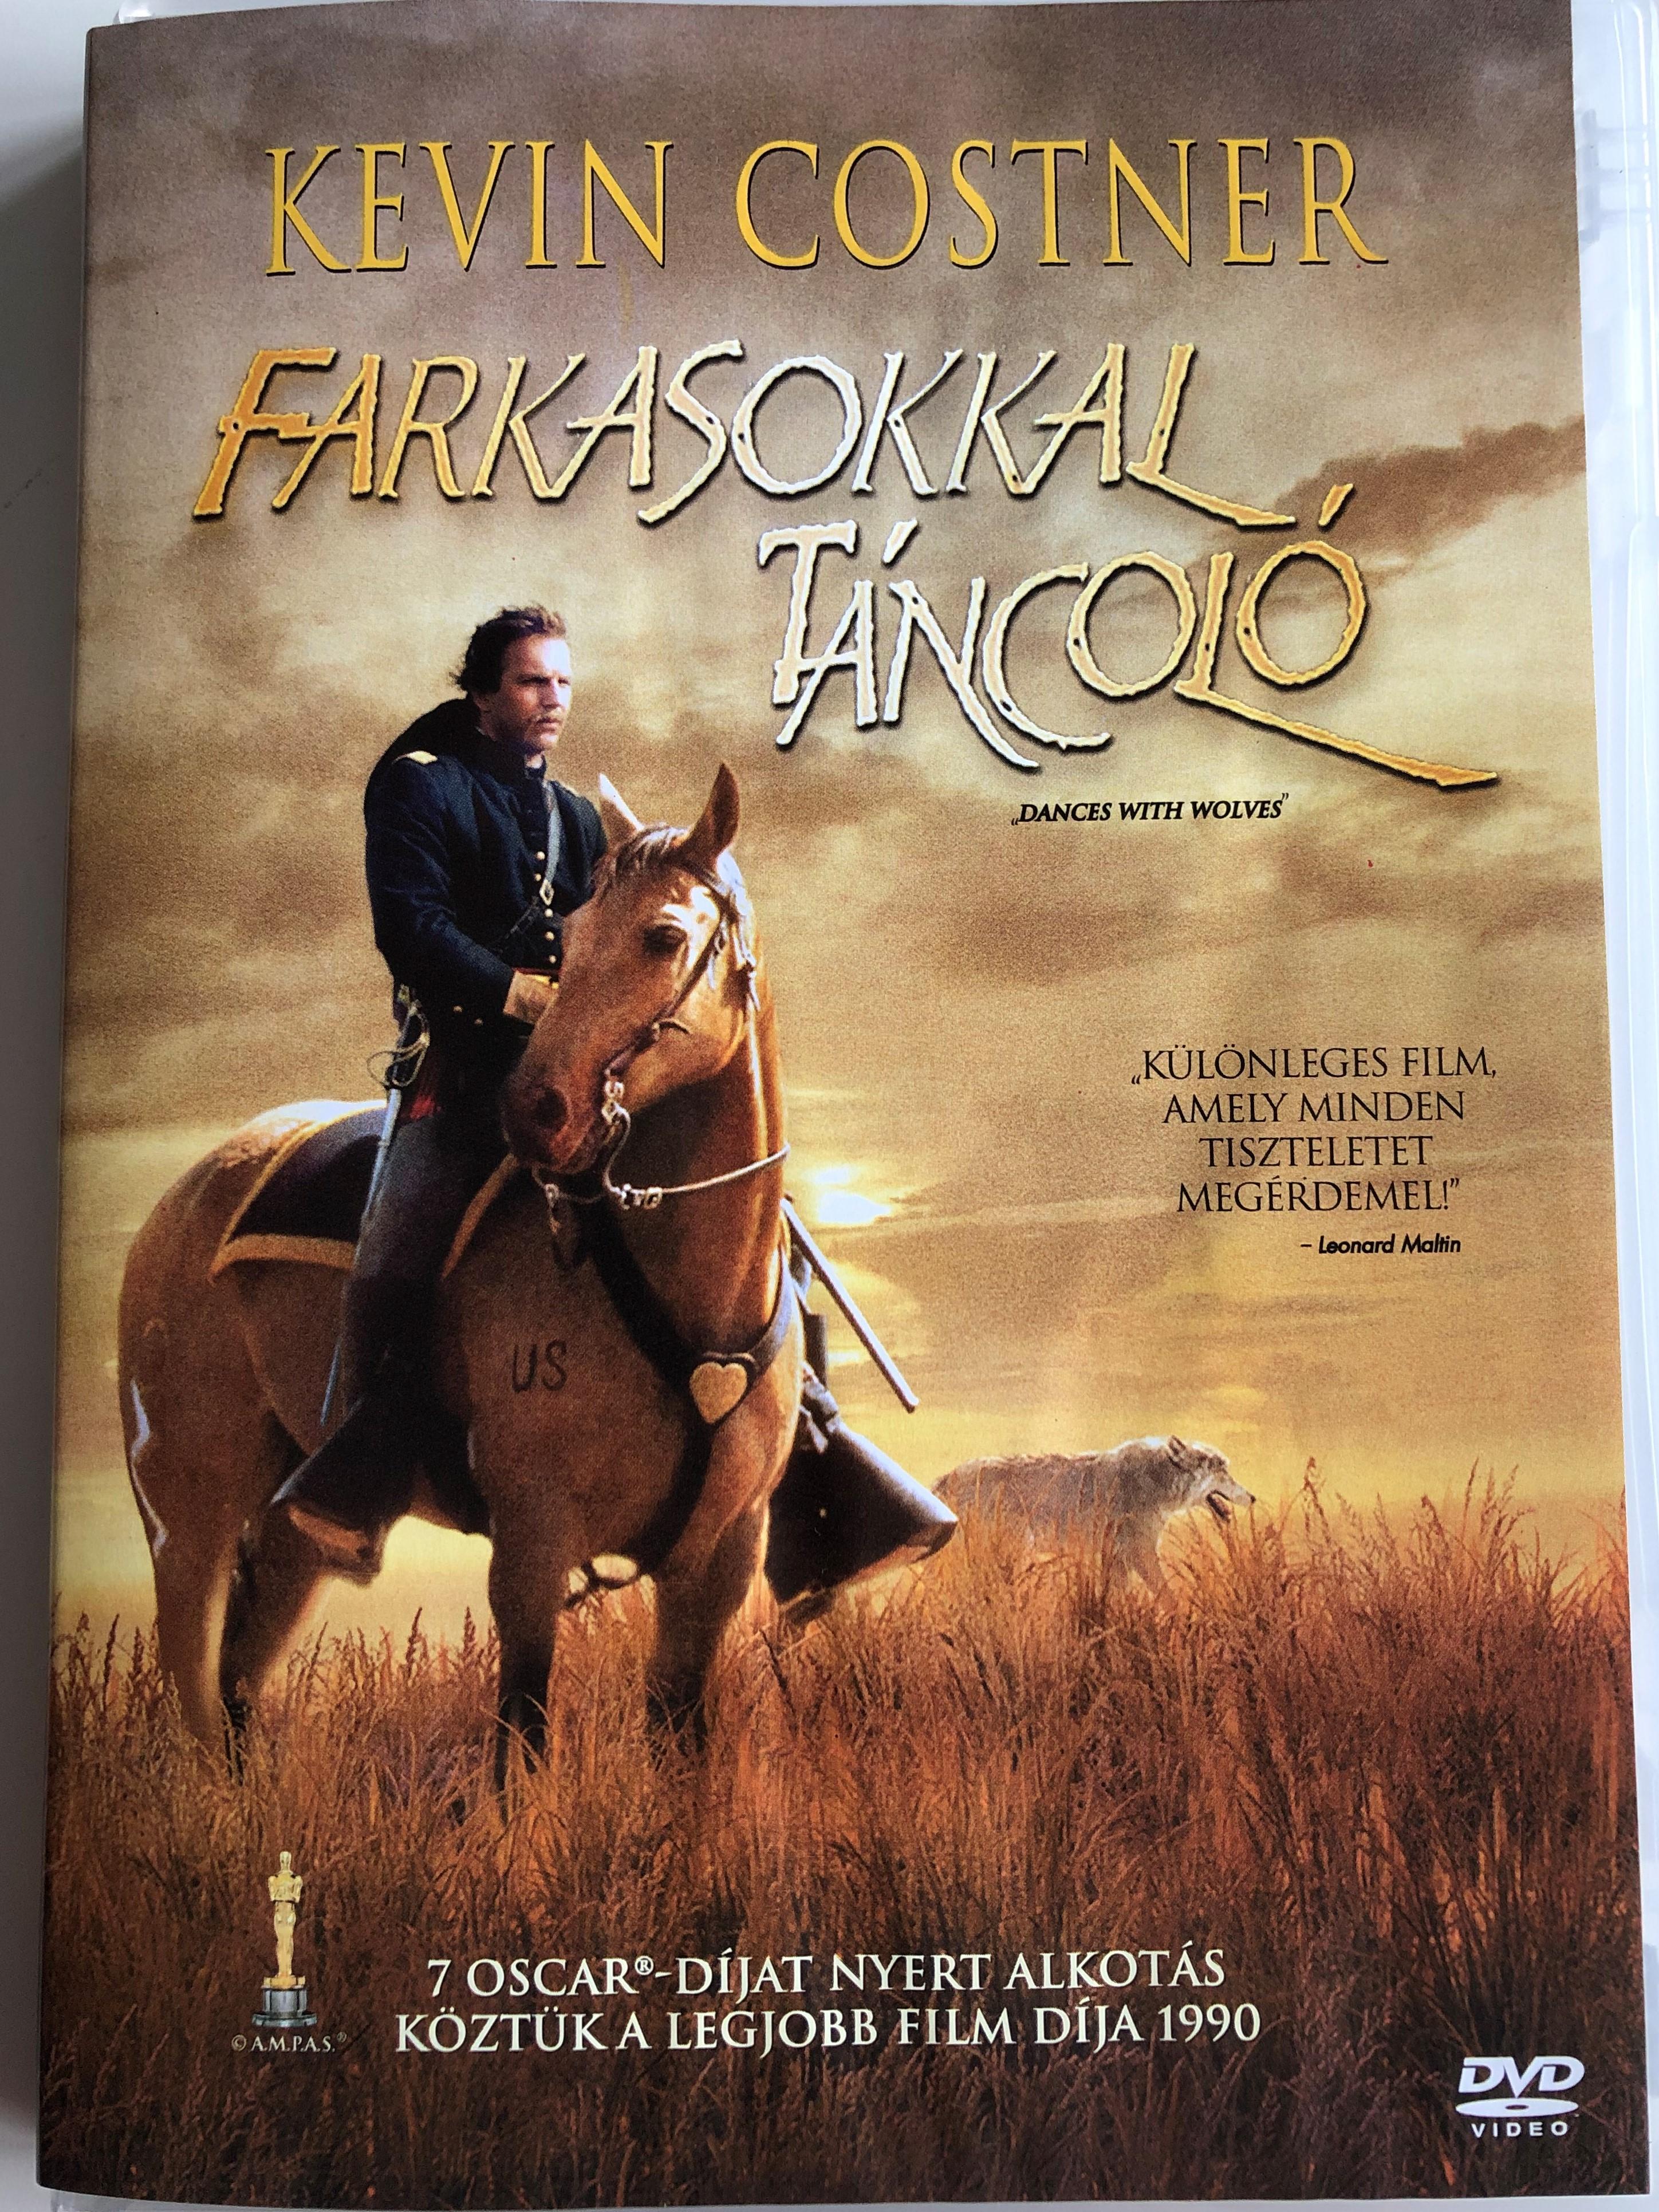 dances-with-wolves-dvd-1990-farkasokkal-t-ncol-directed-by-kevin-costner-1.jpg